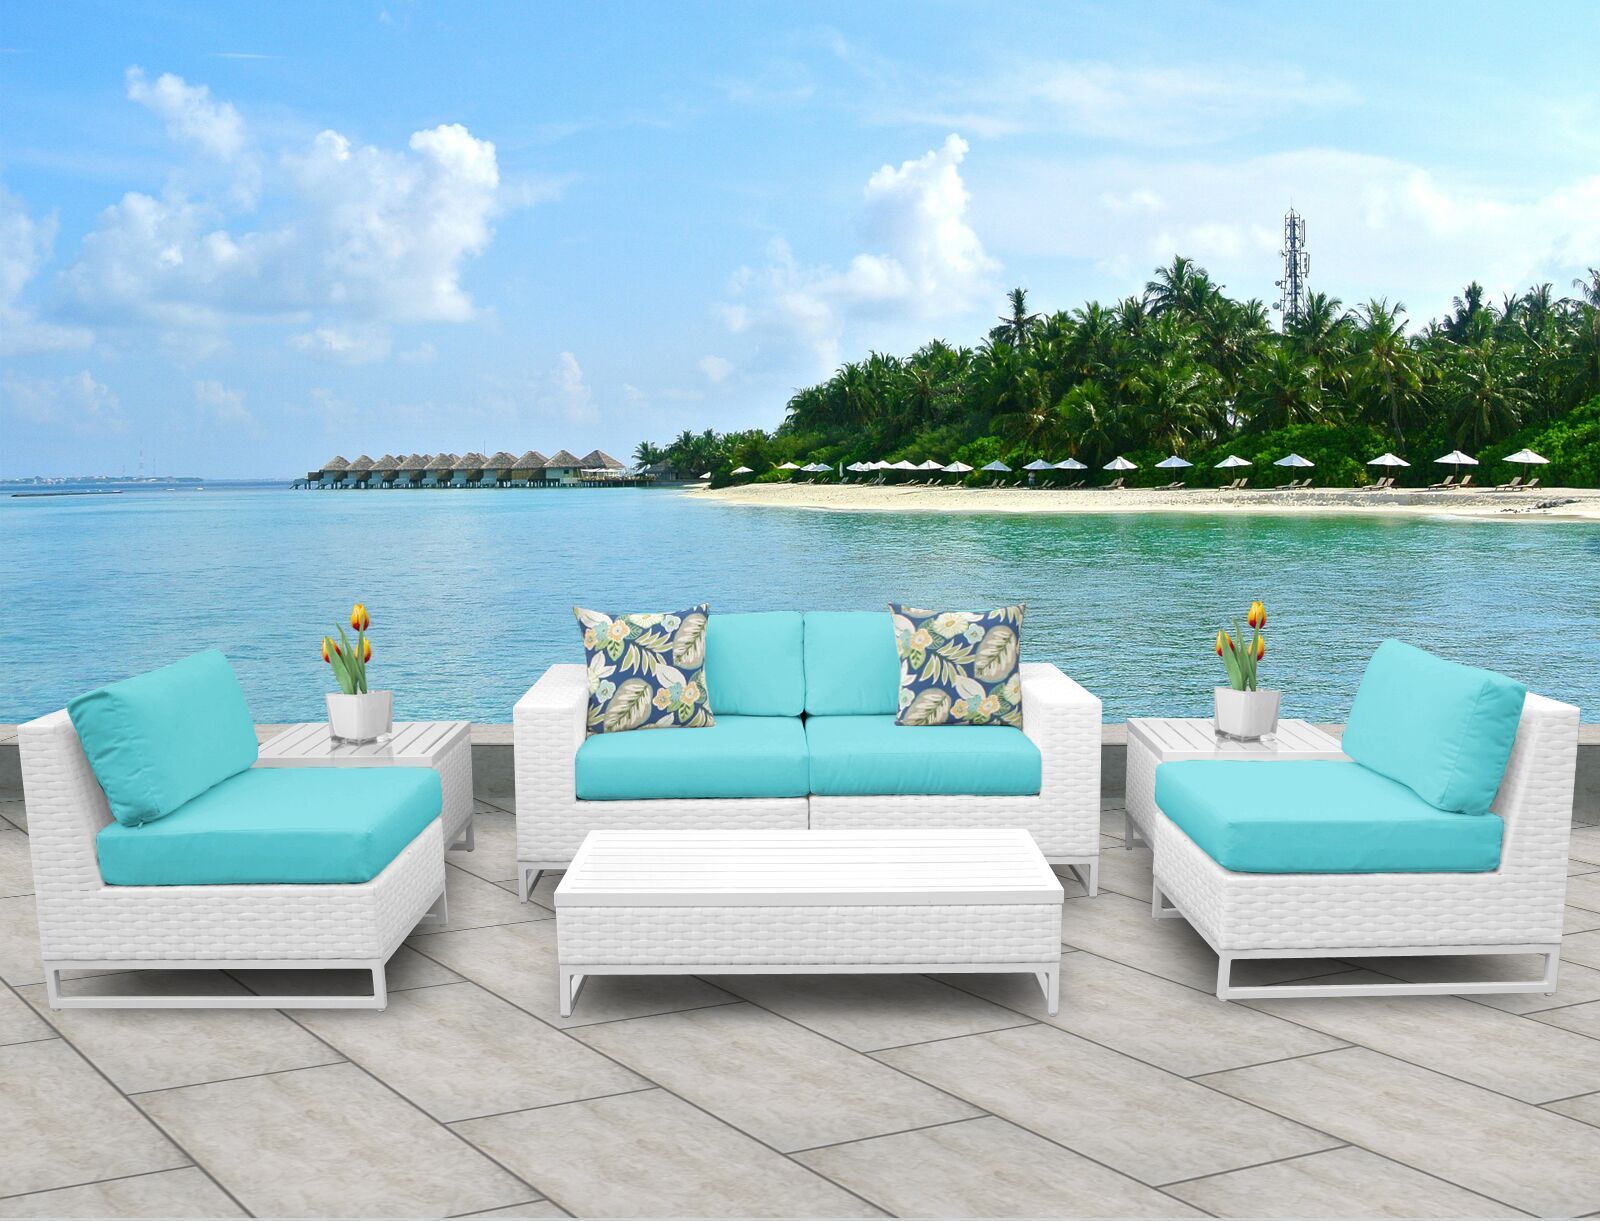 Miami 7 Piece Sofa Set with Cushions Fabric: Aruba